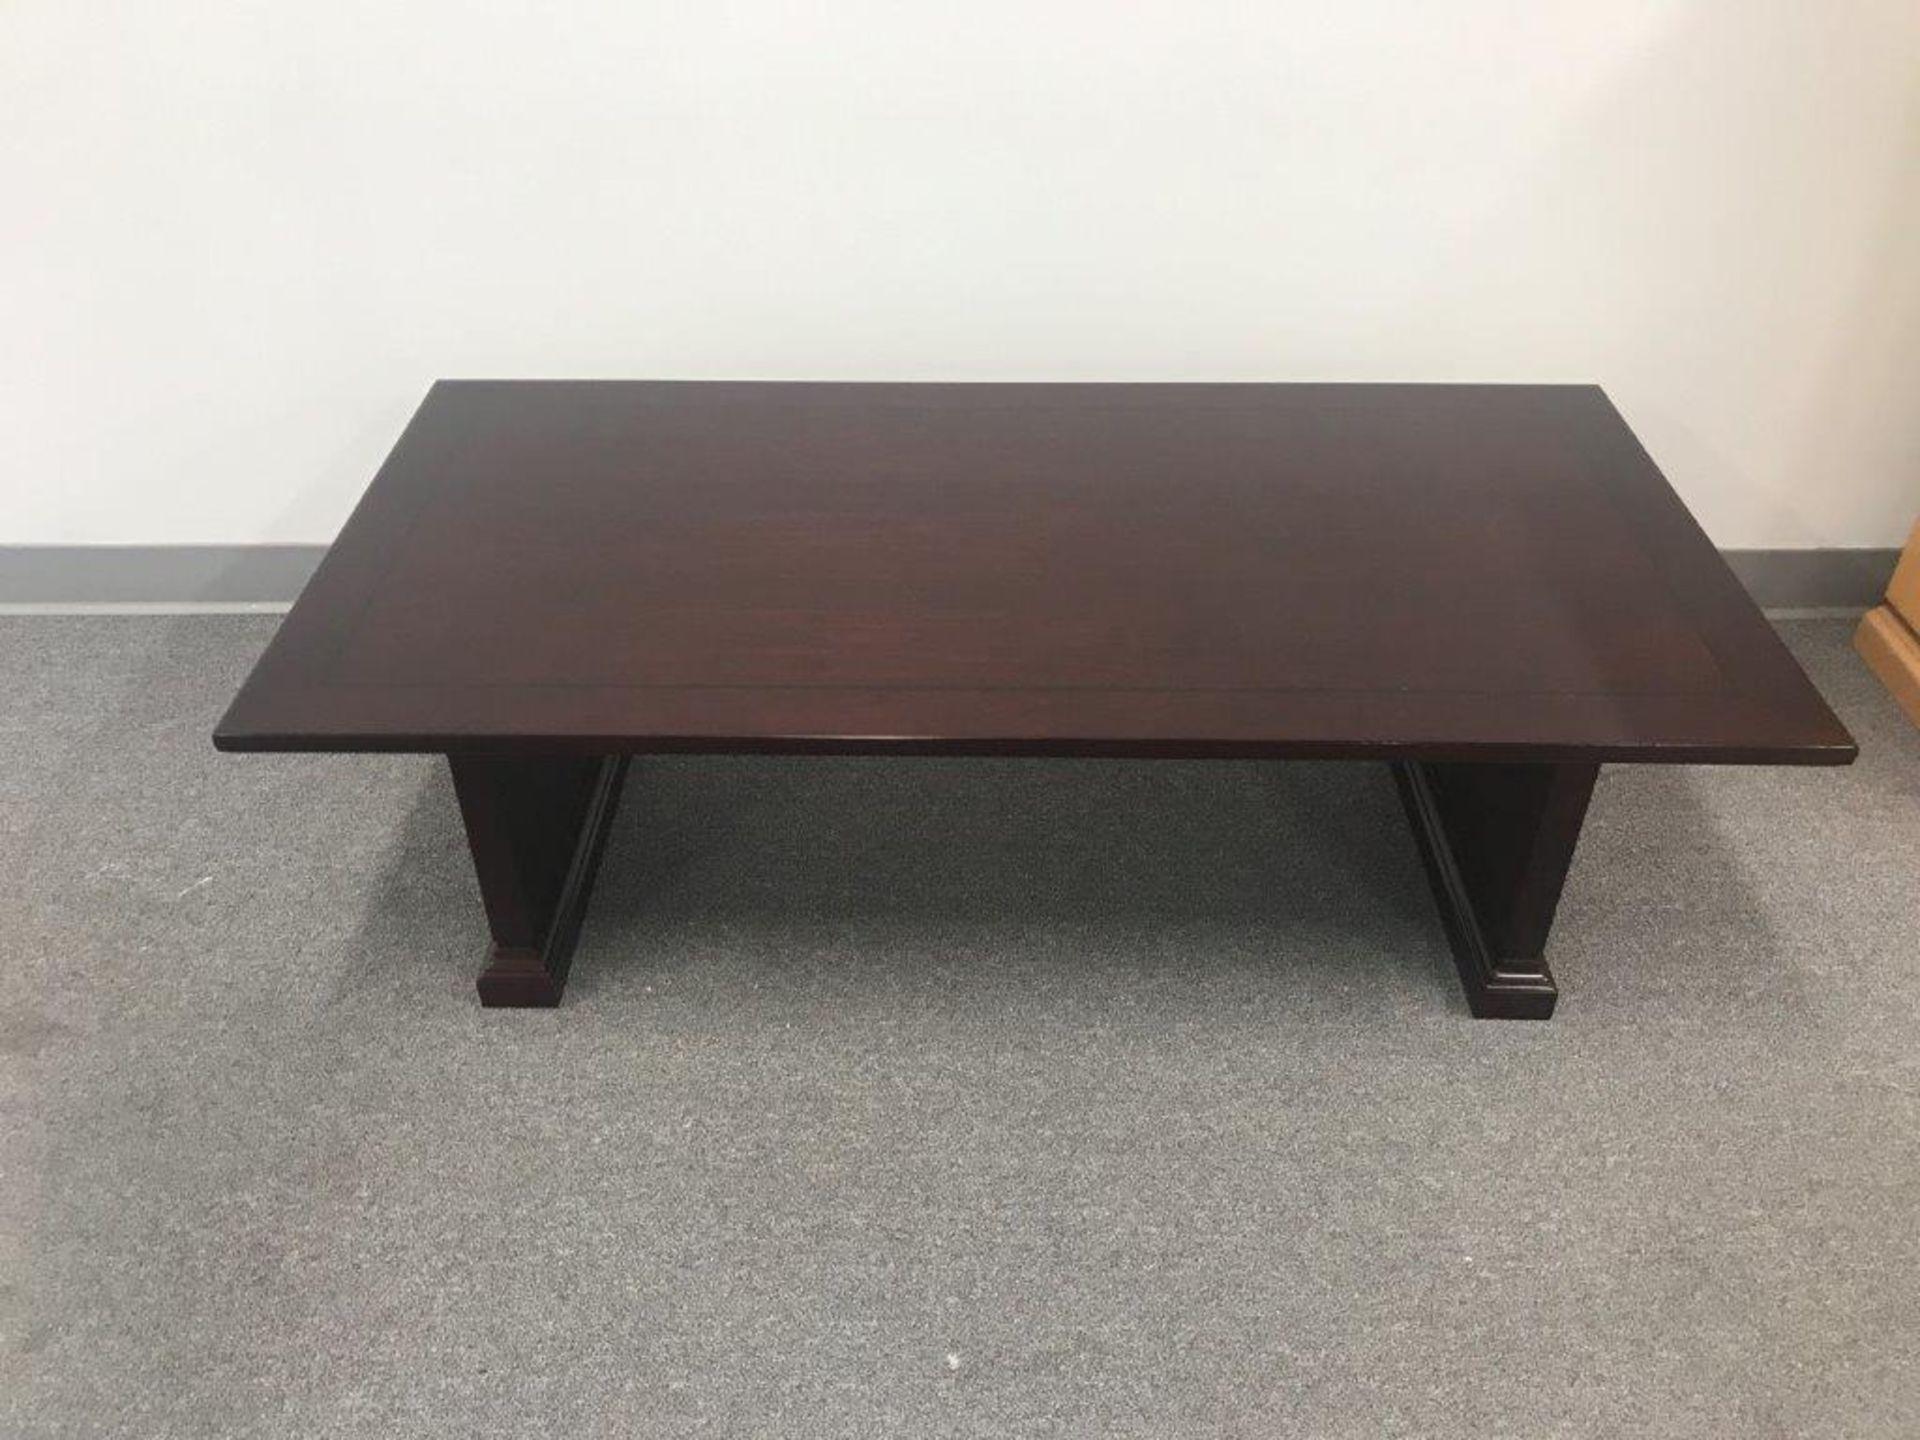 Cherryman Emerald Collection Mahogany Coffee Table (EM-132) (List price each: $550)